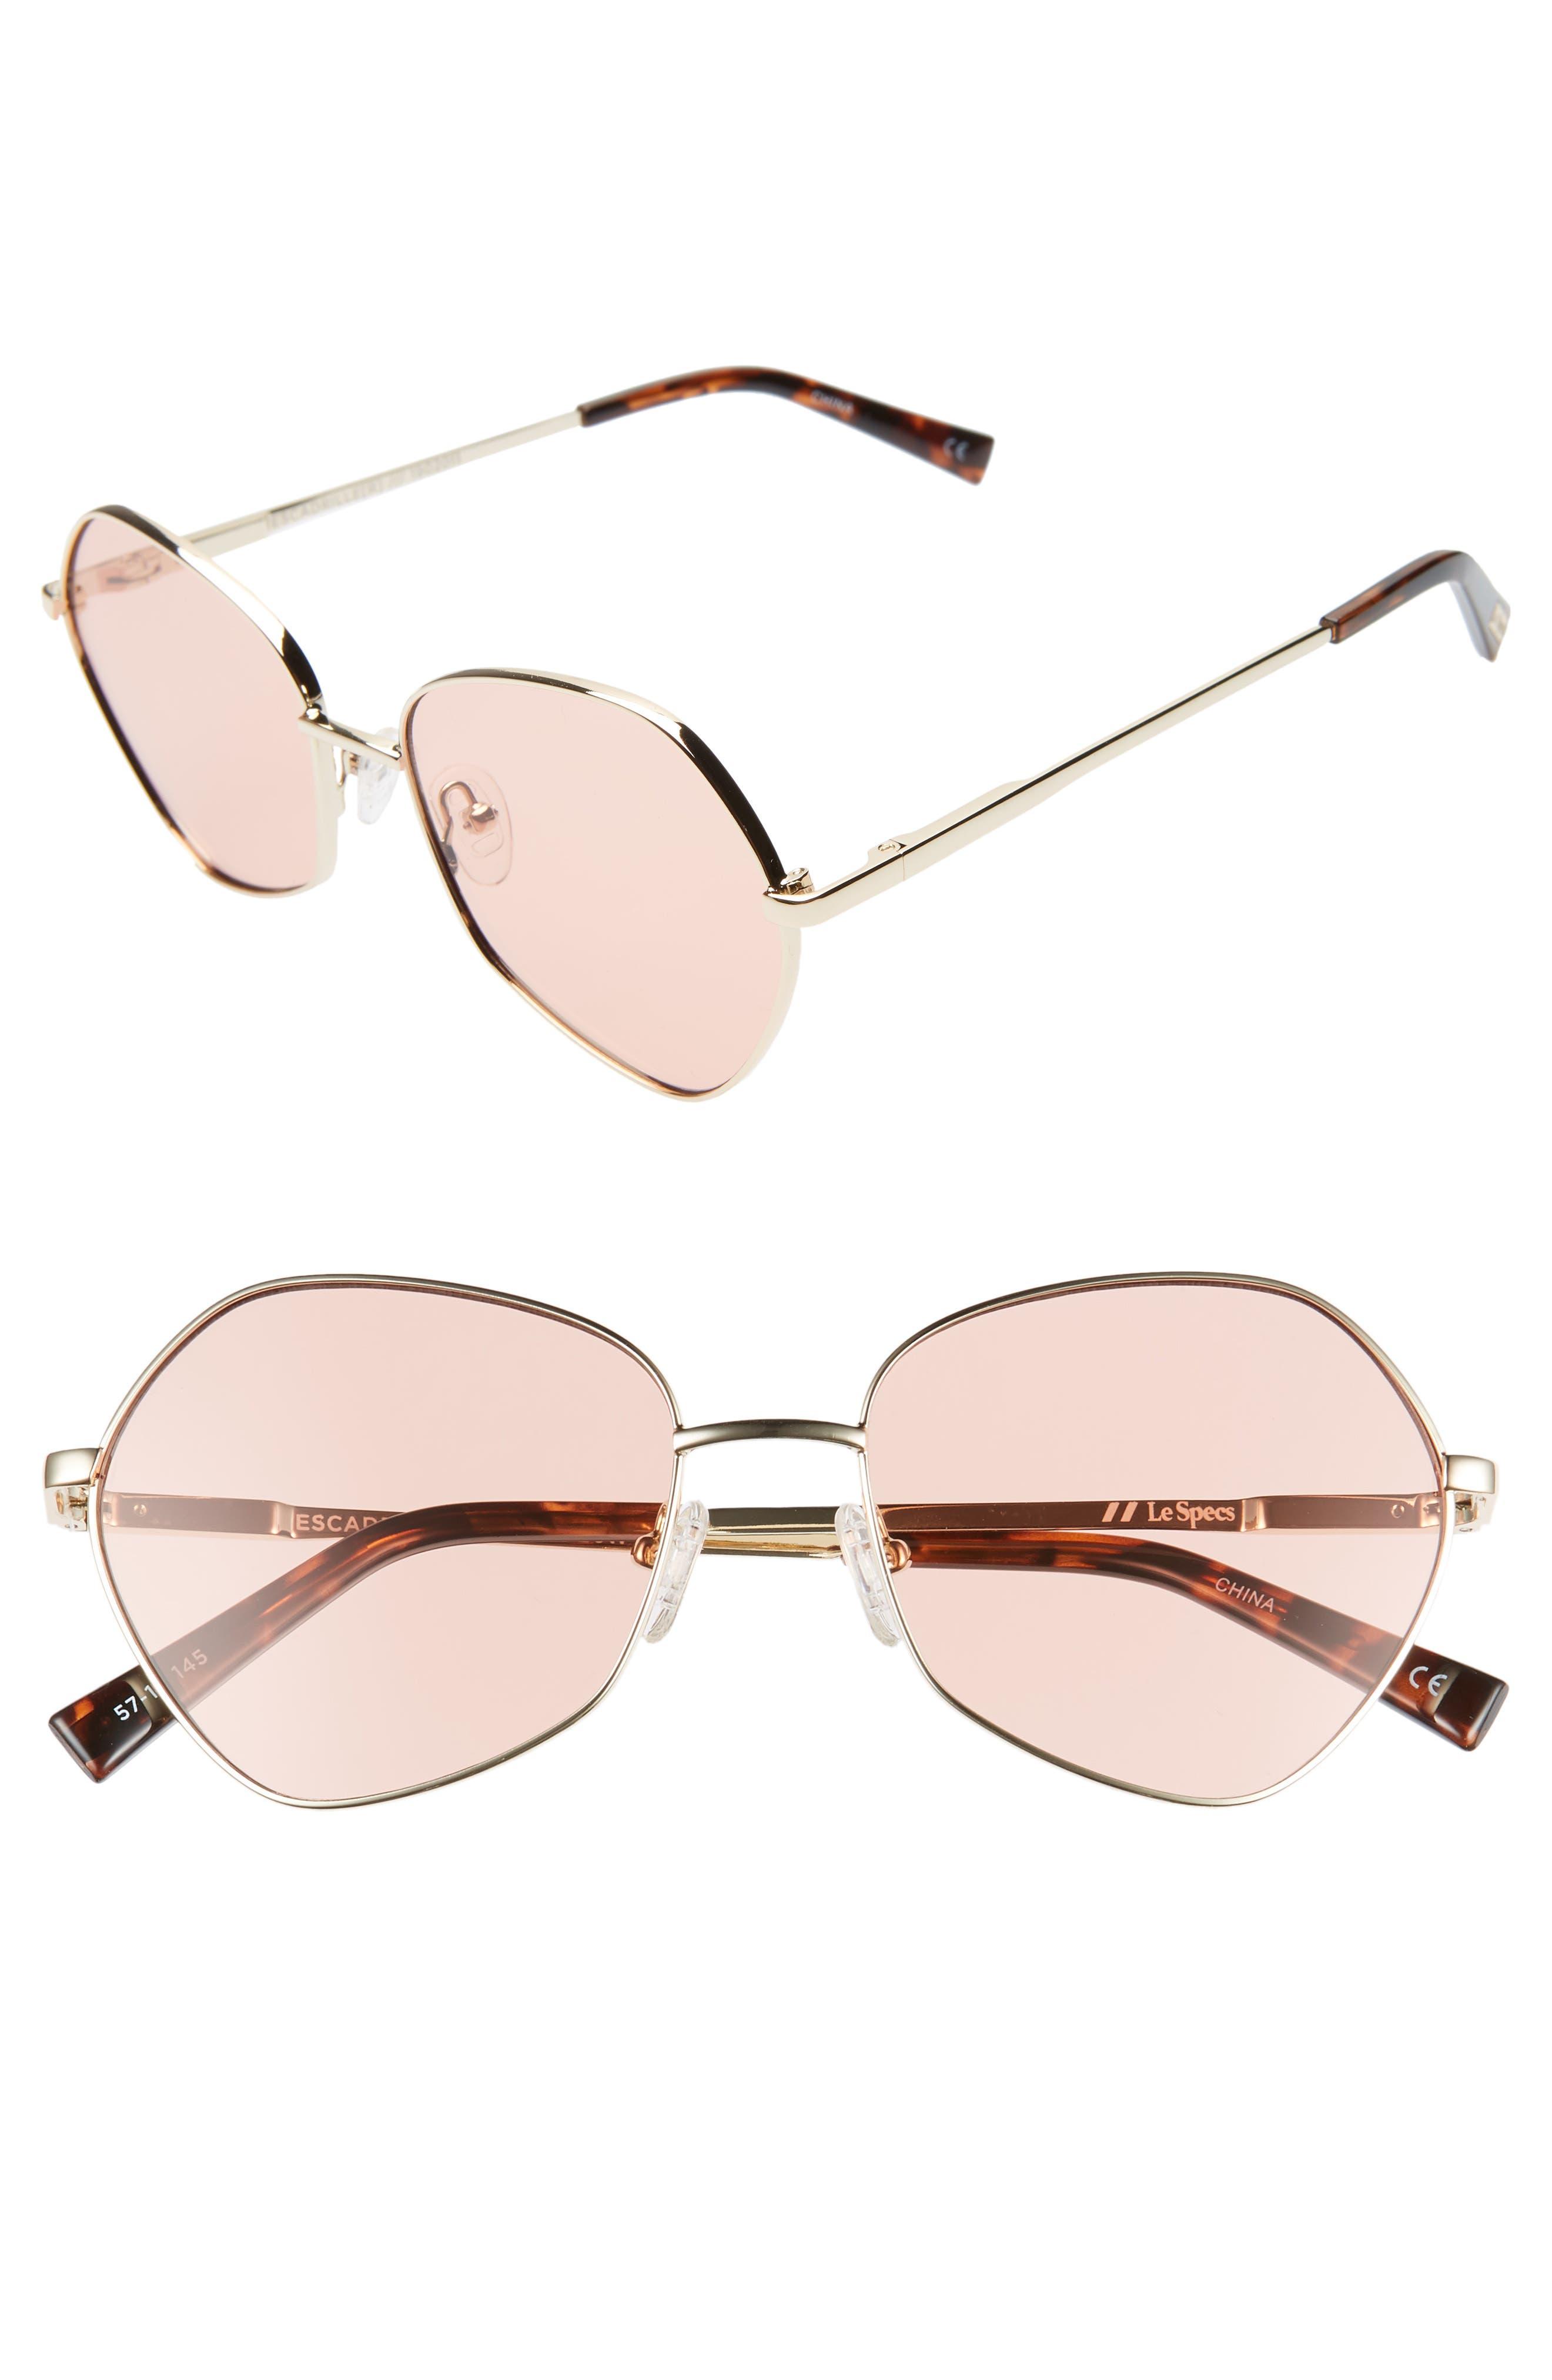 Le Specs Escadrille 57Mm Angular Sunglasses - Gold/ Coral Tint